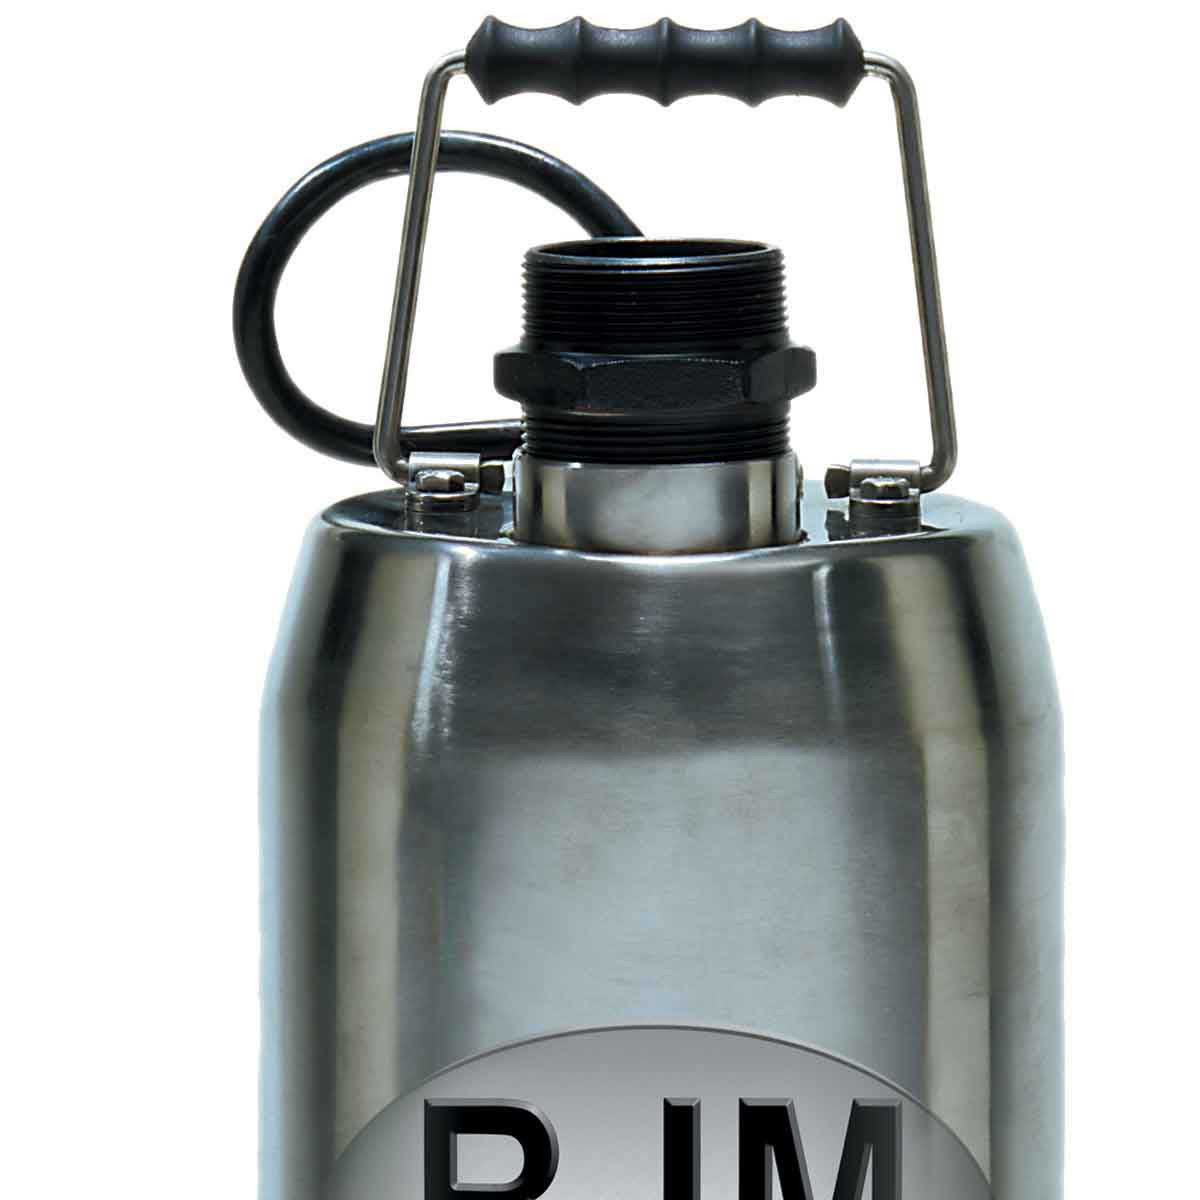 2inch Submersible Pump 110V BJM R750